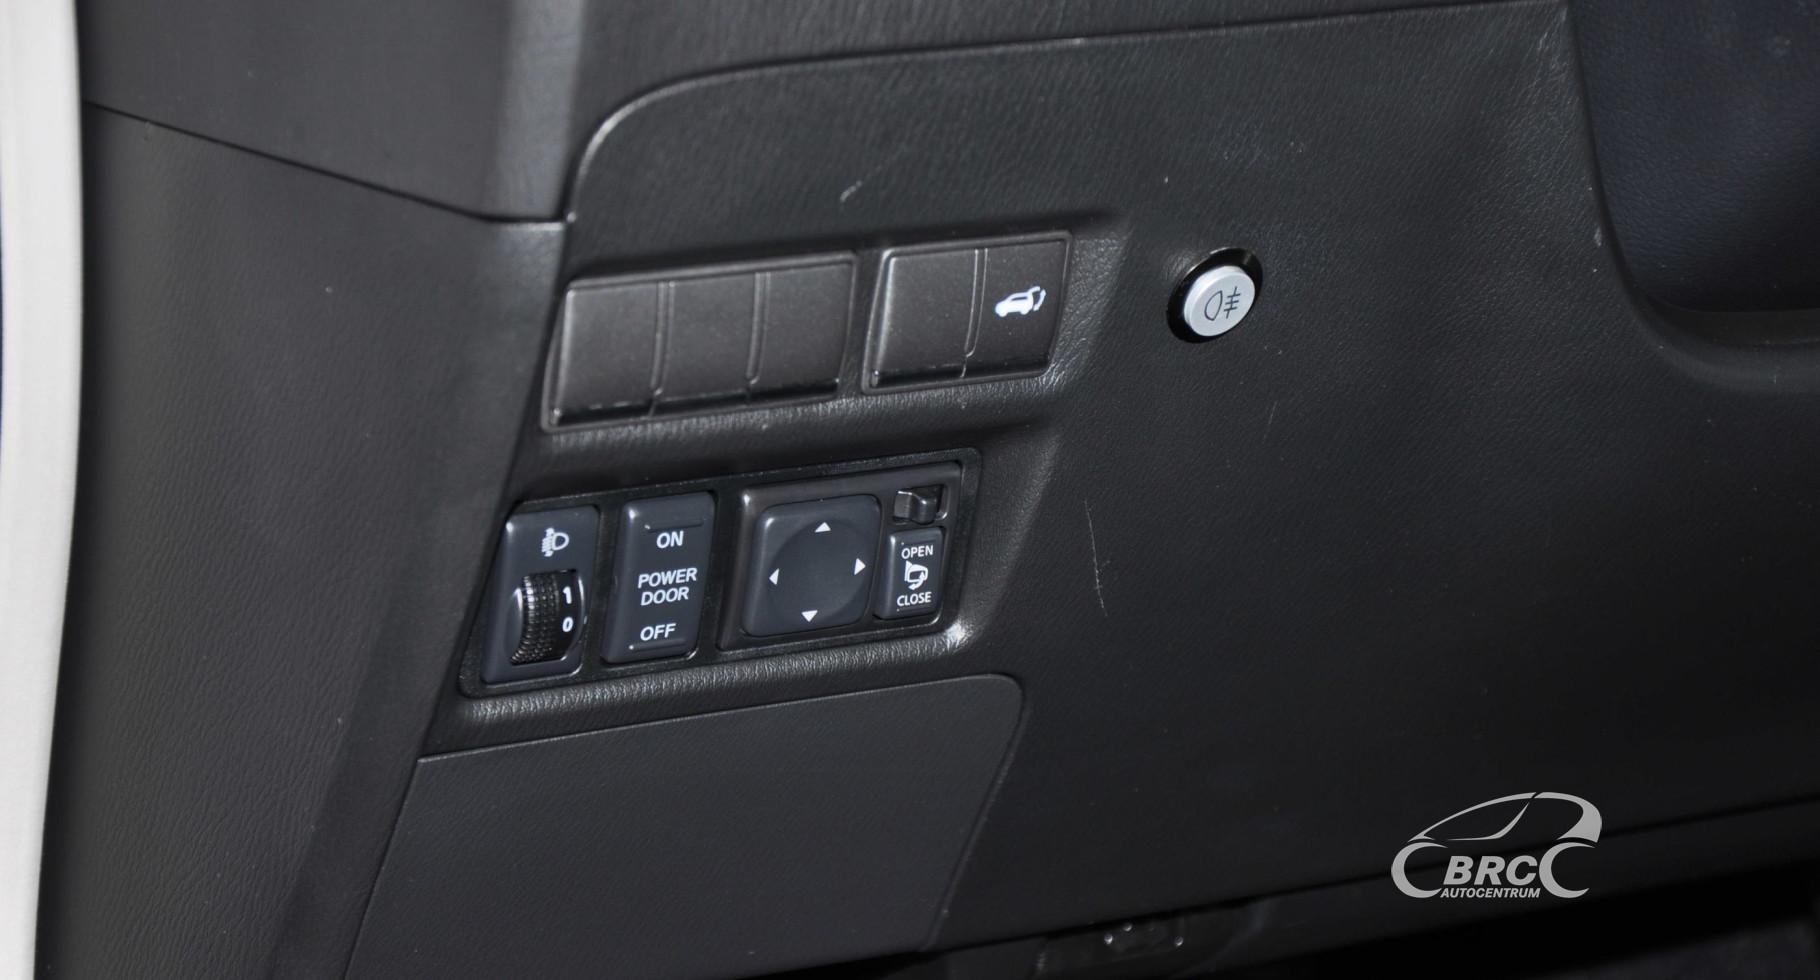 Infiniti QX56 5.6 V8 AWD Automatas